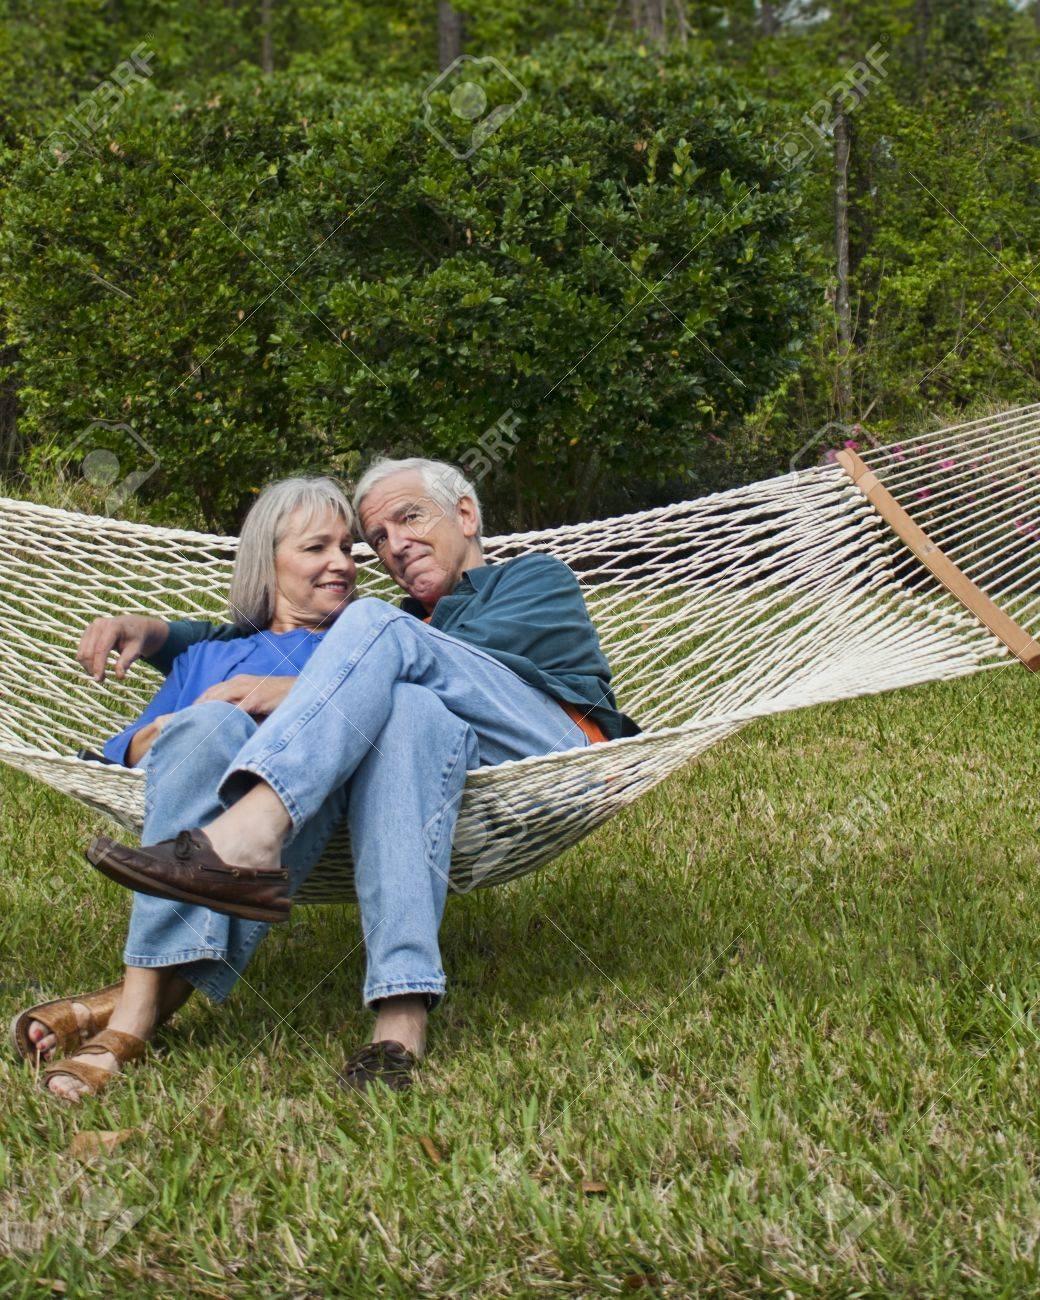 expressive senior couple in hammock age 550-60 Stock Photo - 15059703